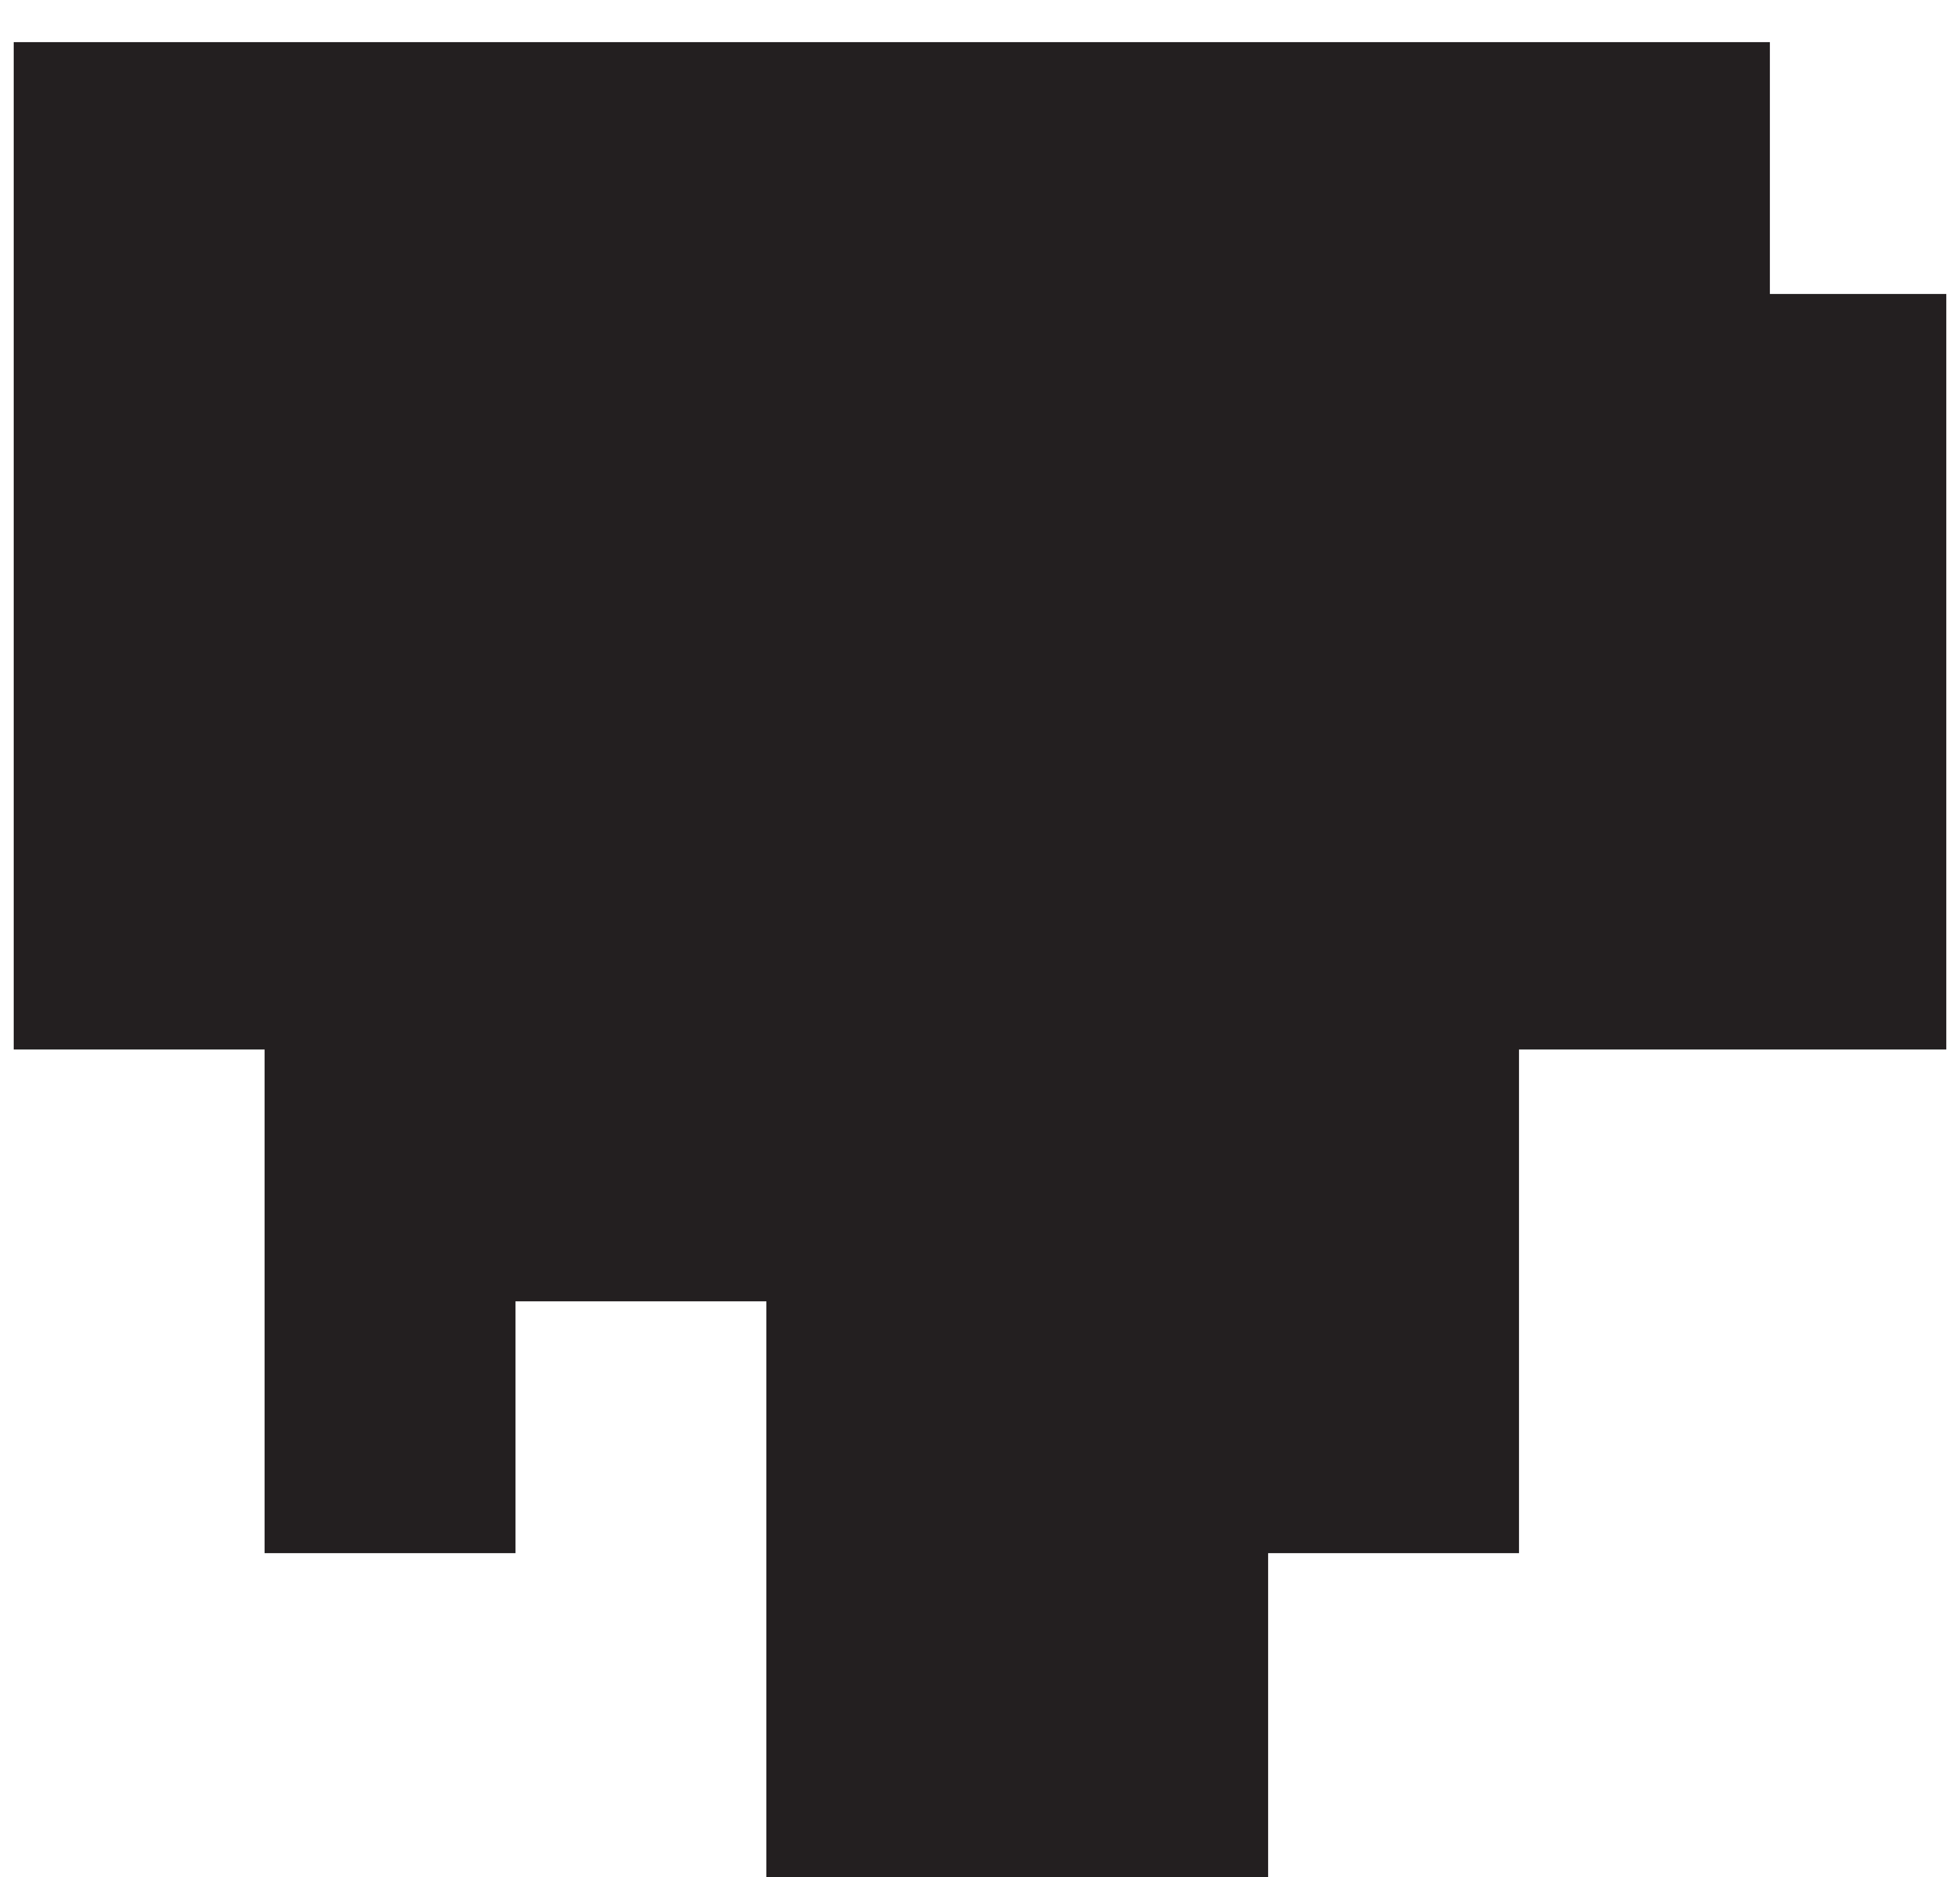 Silhouette Tree Clip art.